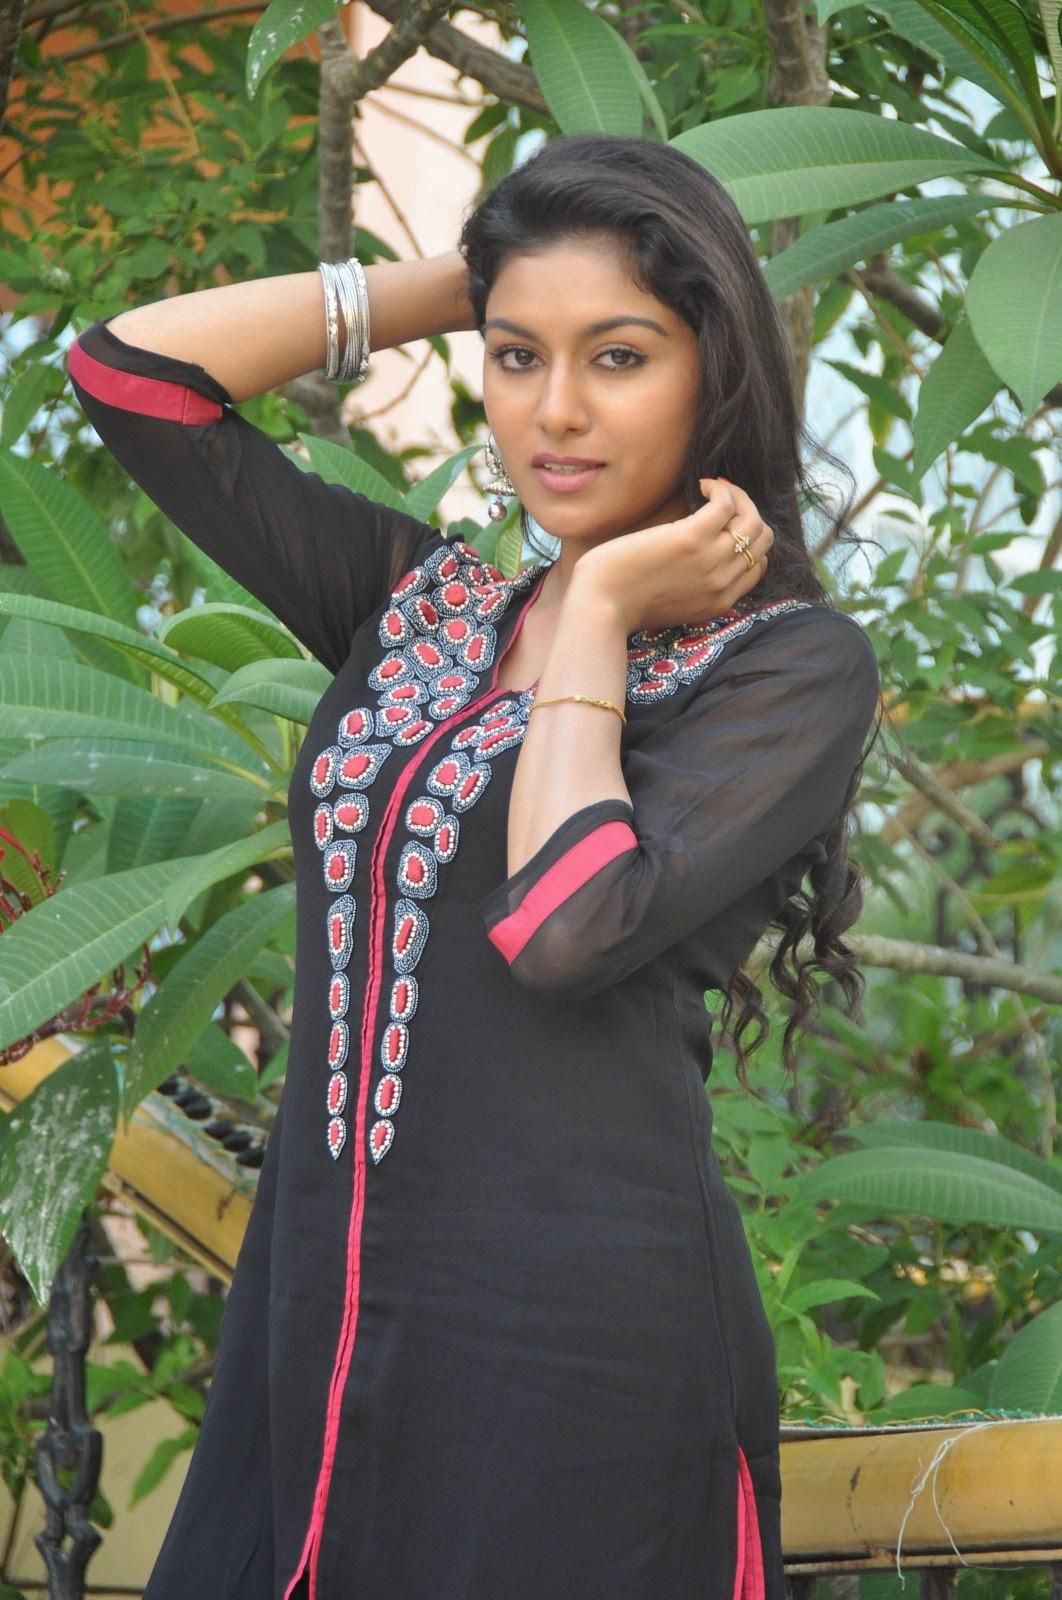 Akshaya glam photo shoot gallery-HQ-Photo-16